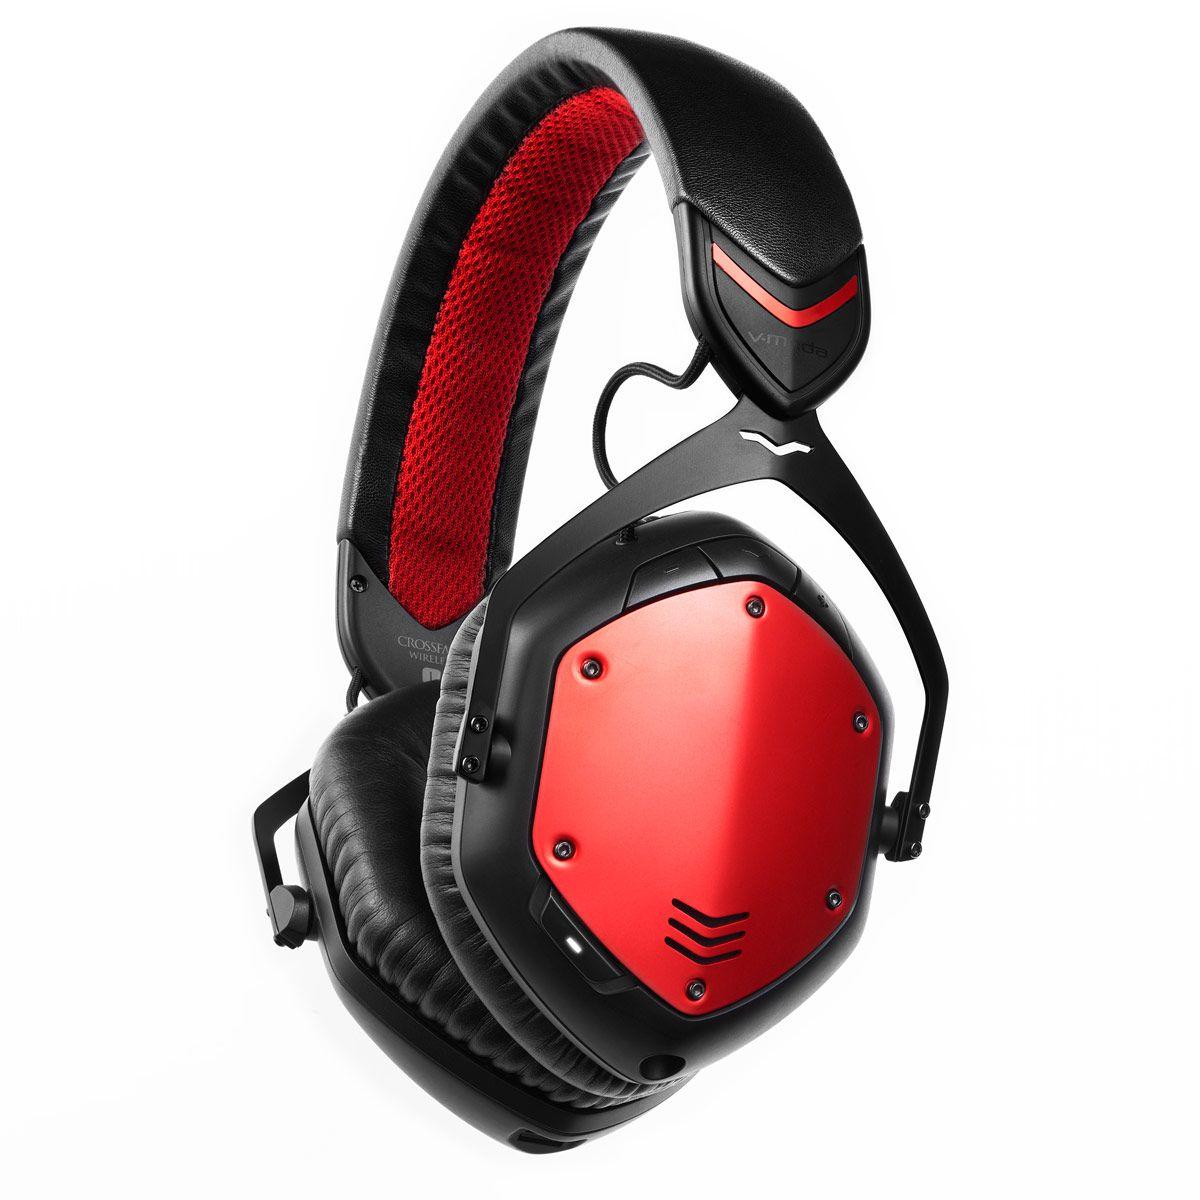 The V-Moda Crossfade Wireless over-ear headphones